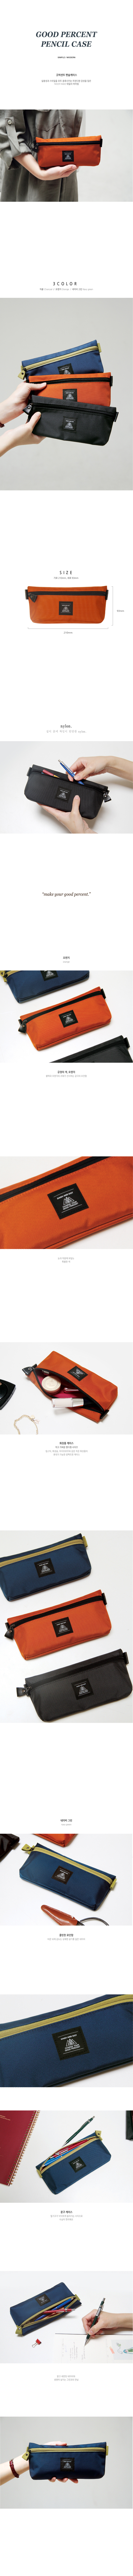 good percent pen pouch - 대시앤도트, 12,000원, 패브릭필통, 심플